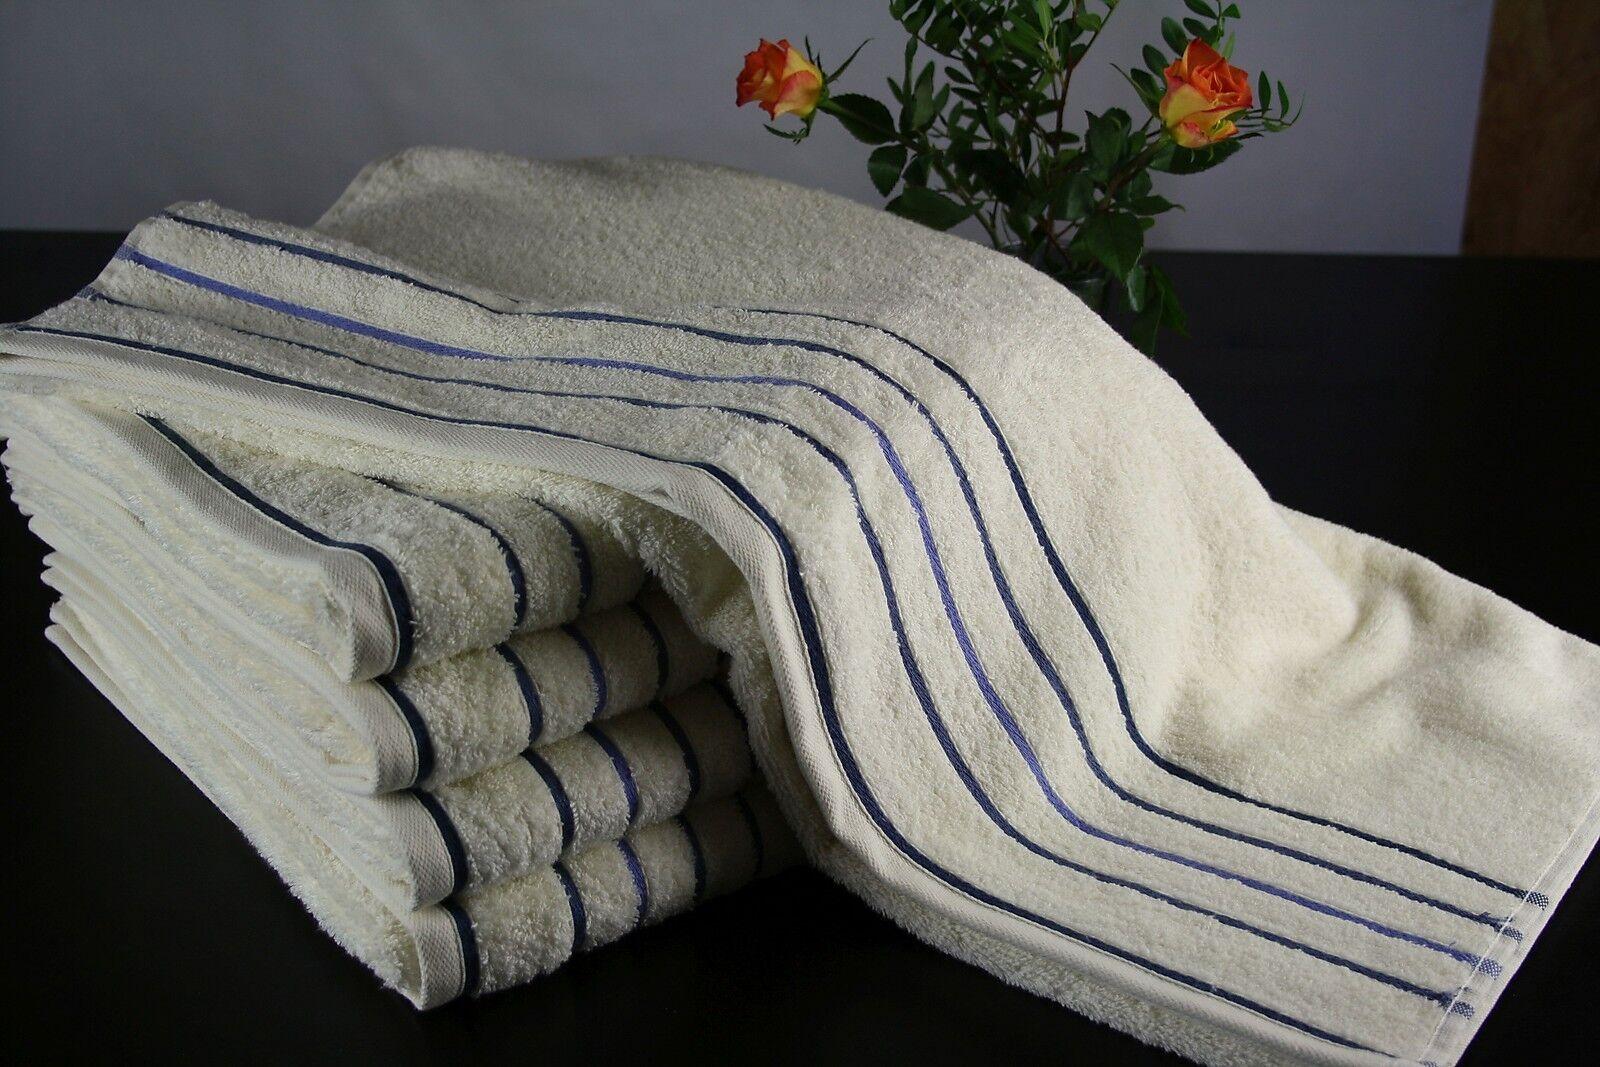 10 10 10 wollWeiße Duschtücher,100 % Baumwolle 500 g m², ca. 70x140 cm, blaue Streifen ca54e5